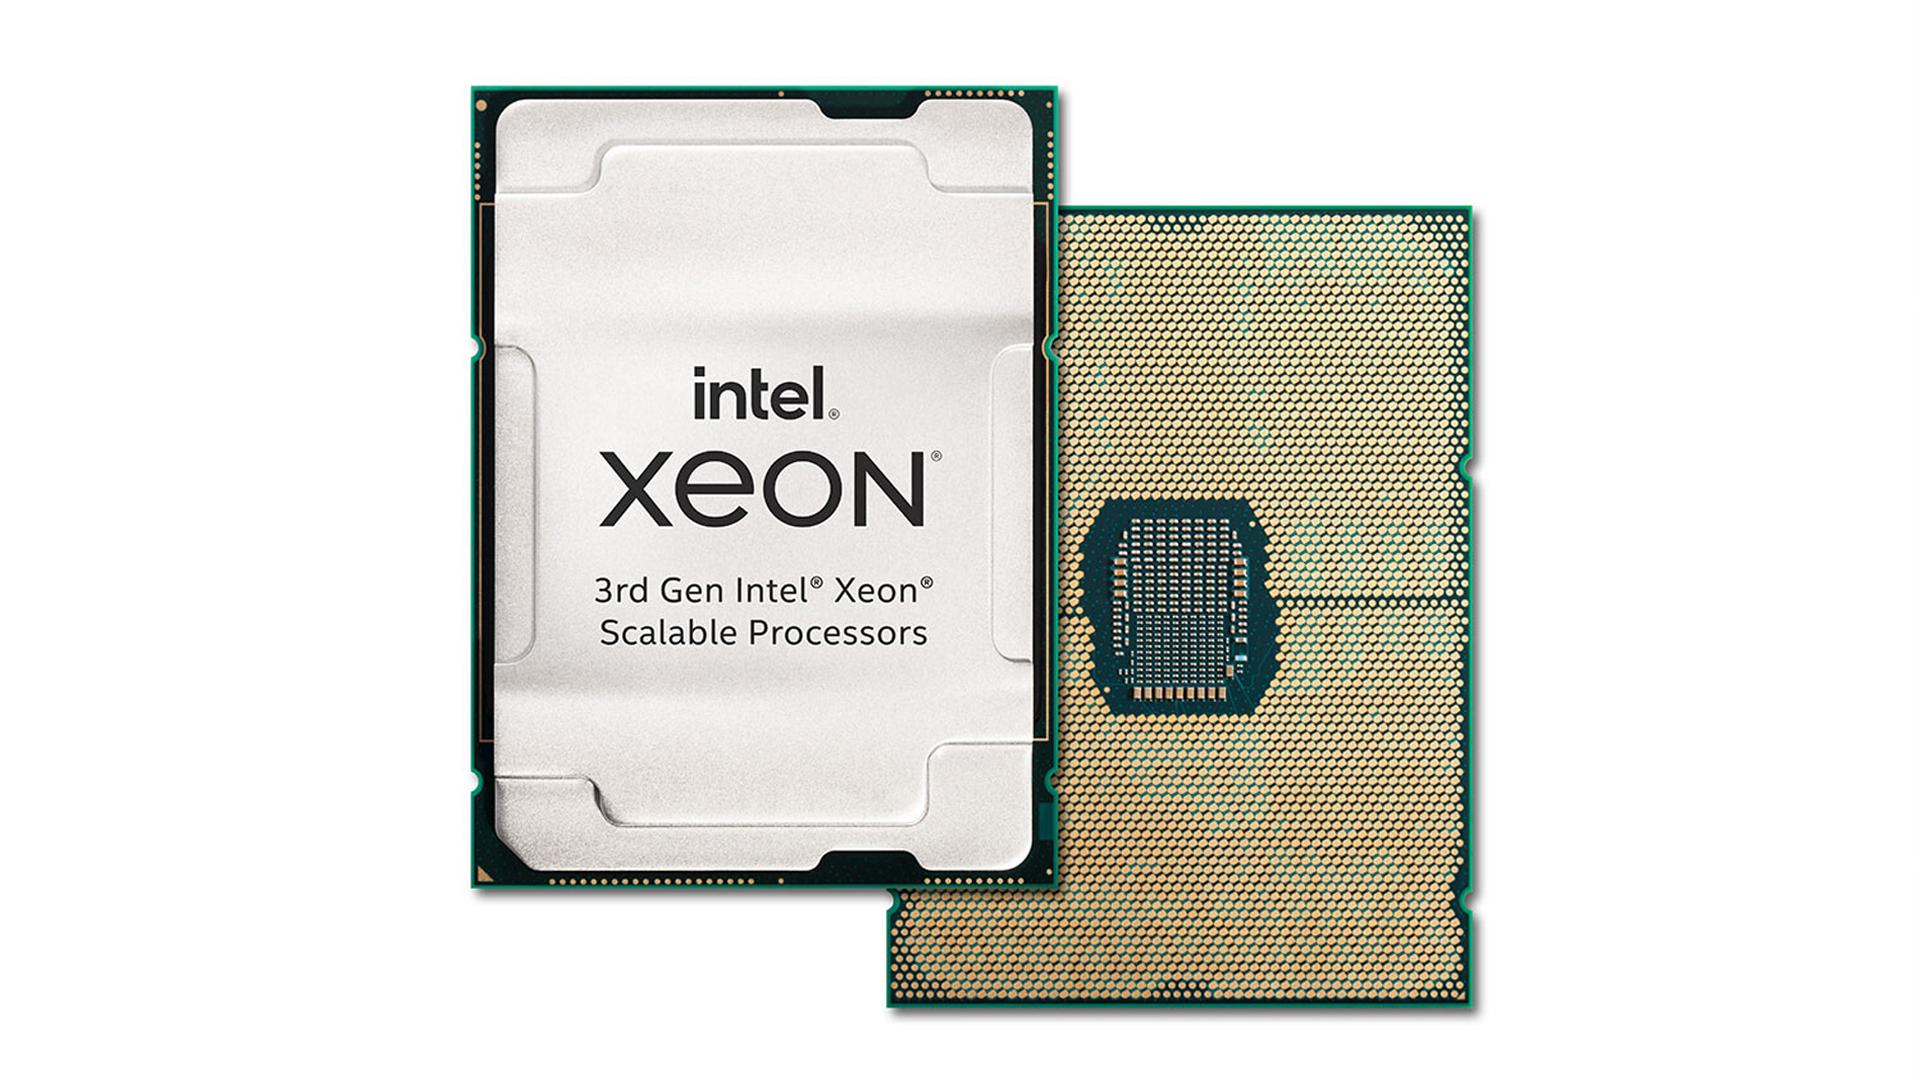 Intel Xeon Scalable Processors Ice Lake 00